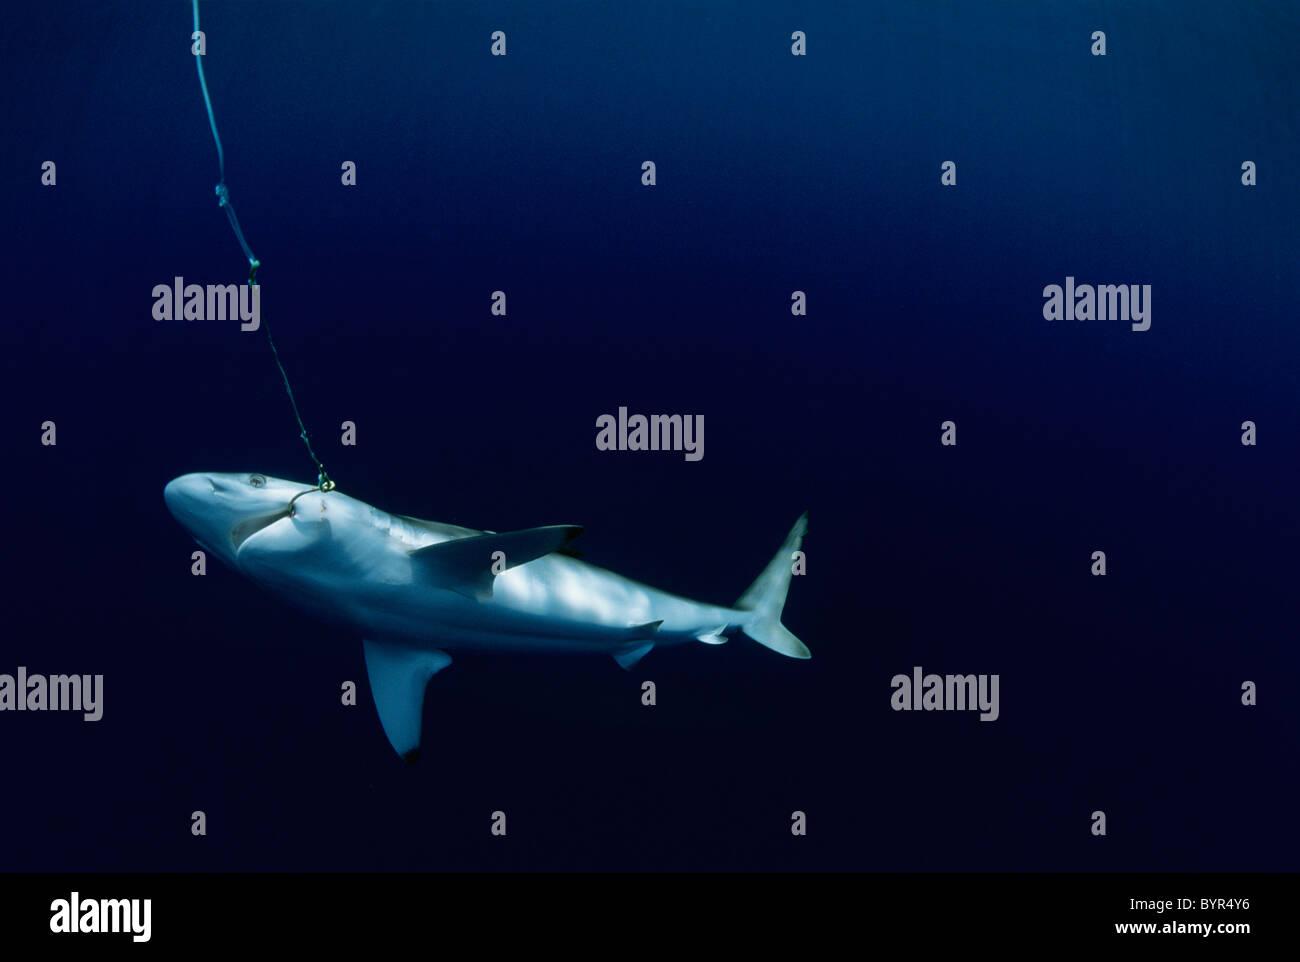 Live Oceanic Blacktip Shark (Carcharhinus limbatus) hooked on long line, Cocos Island, Costa Rica - Pacific Ocean. Stock Photo